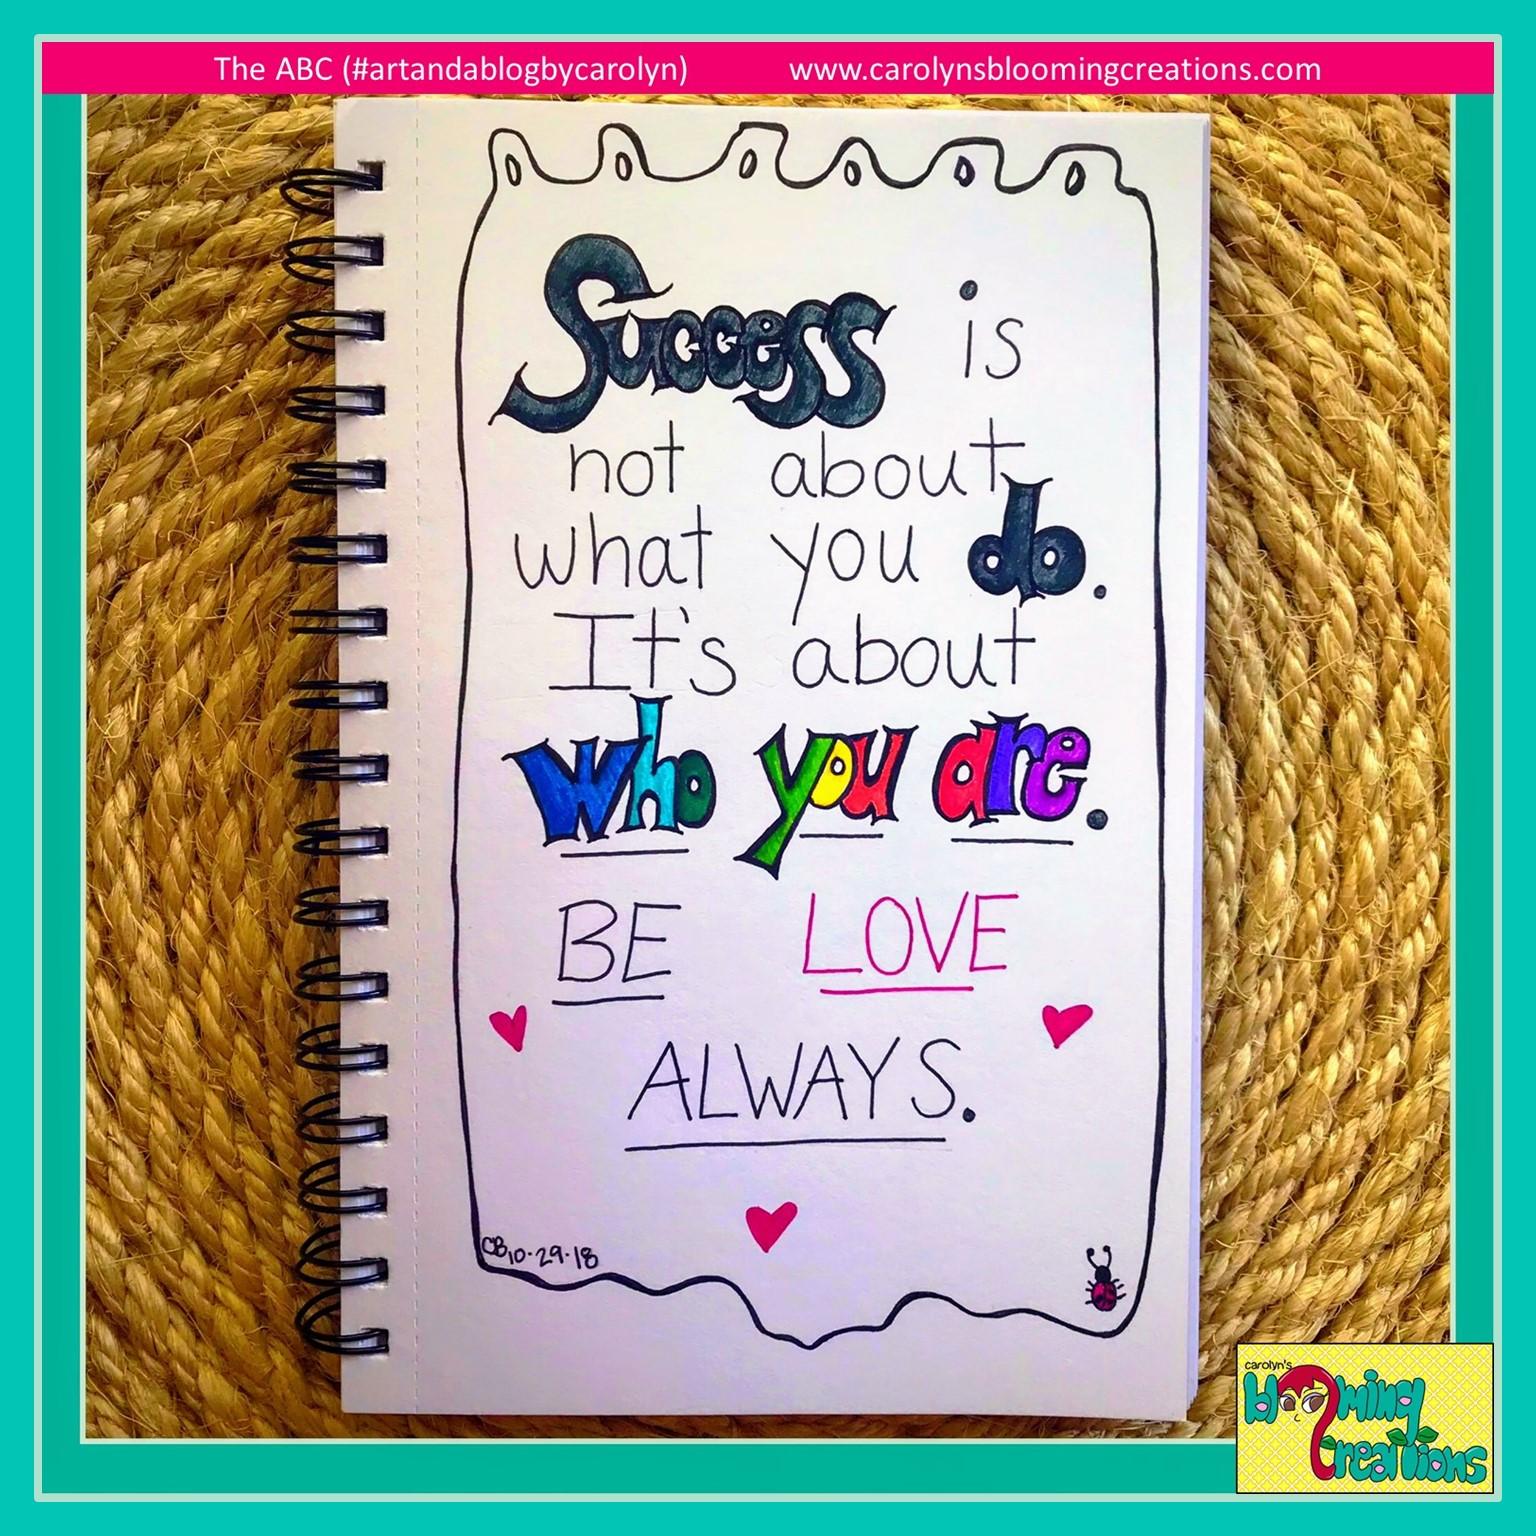 Always Be Love